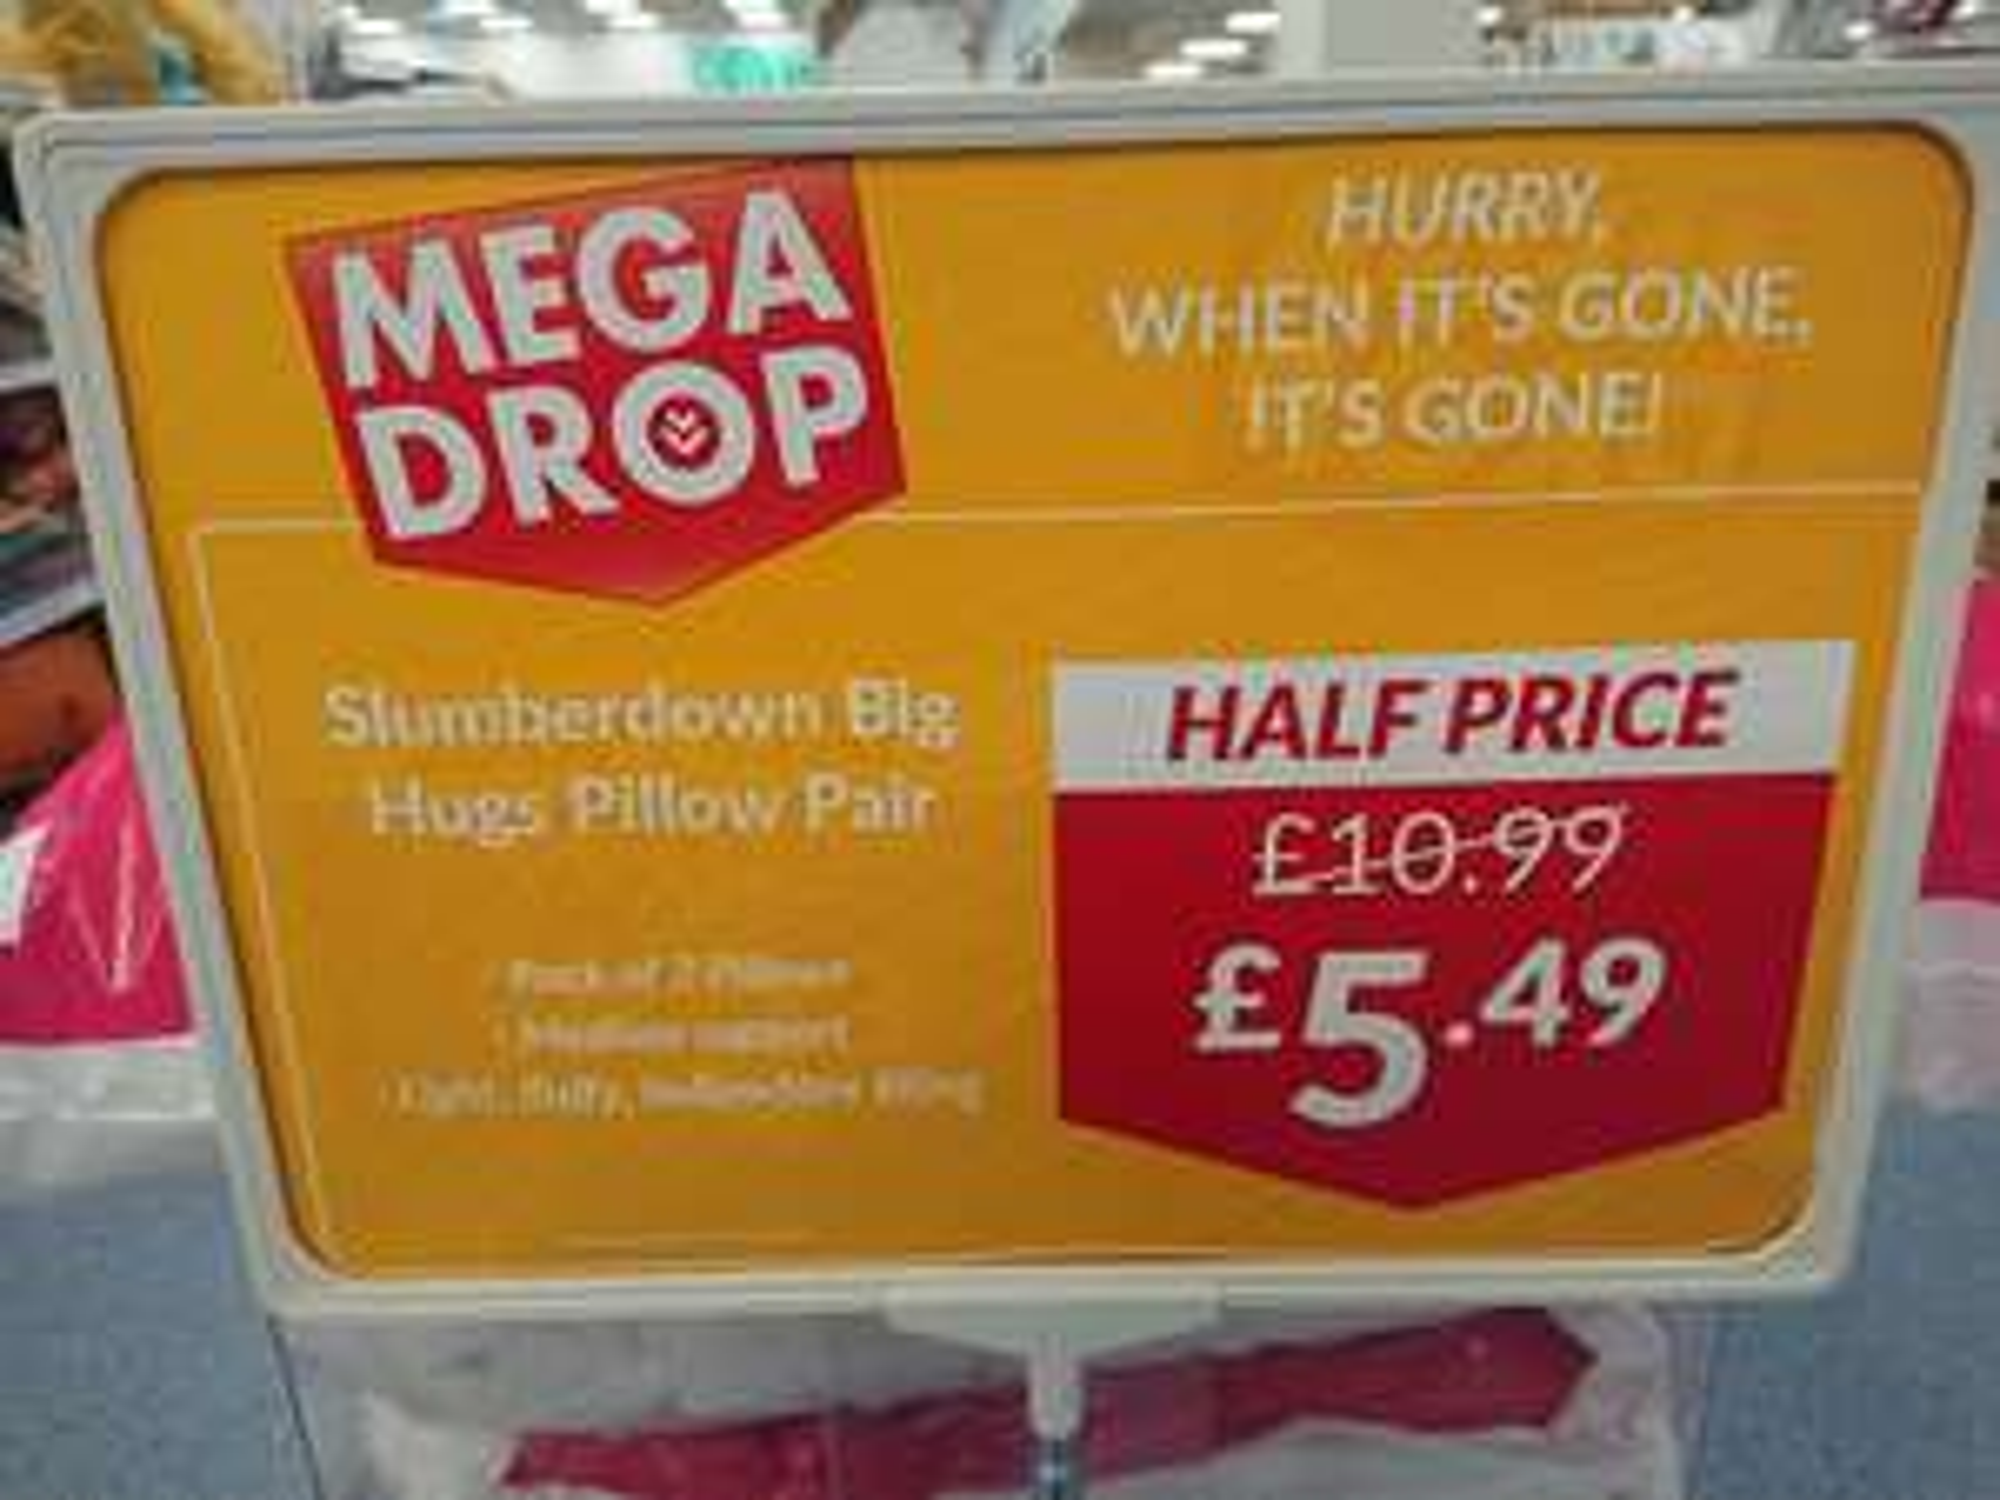 Slumberdown Big Hugs Pillow Pair - White £5.49 The Range  instore or £3.95 p&p 2 £2 c&c